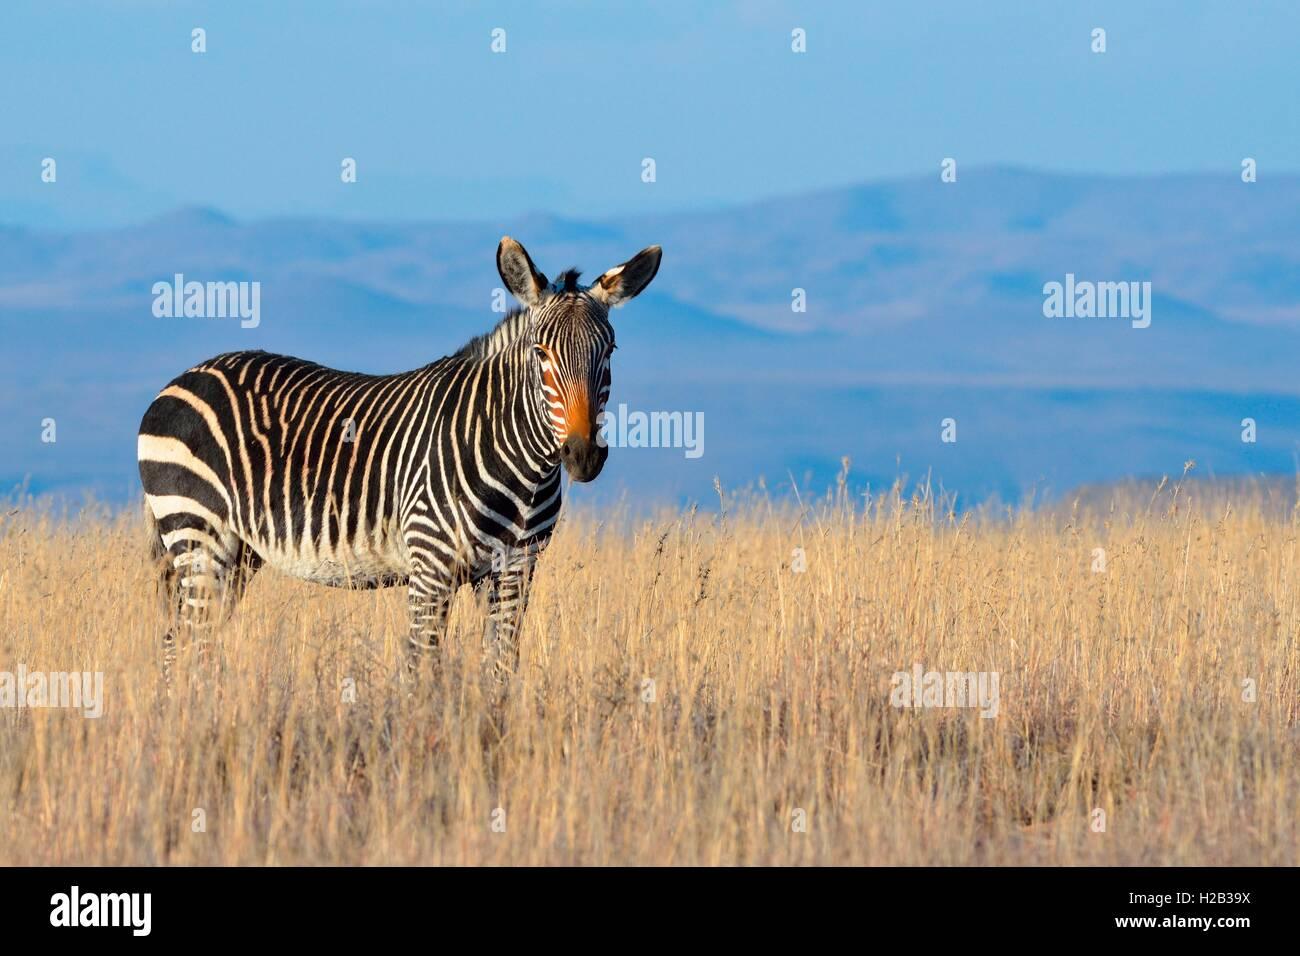 Cape Mountain zebra Equus zebra (ZEBRA), de pie en el pasto seco, Mountain Zebra National Park, Eastern Cape, Sudáfrica Imagen De Stock